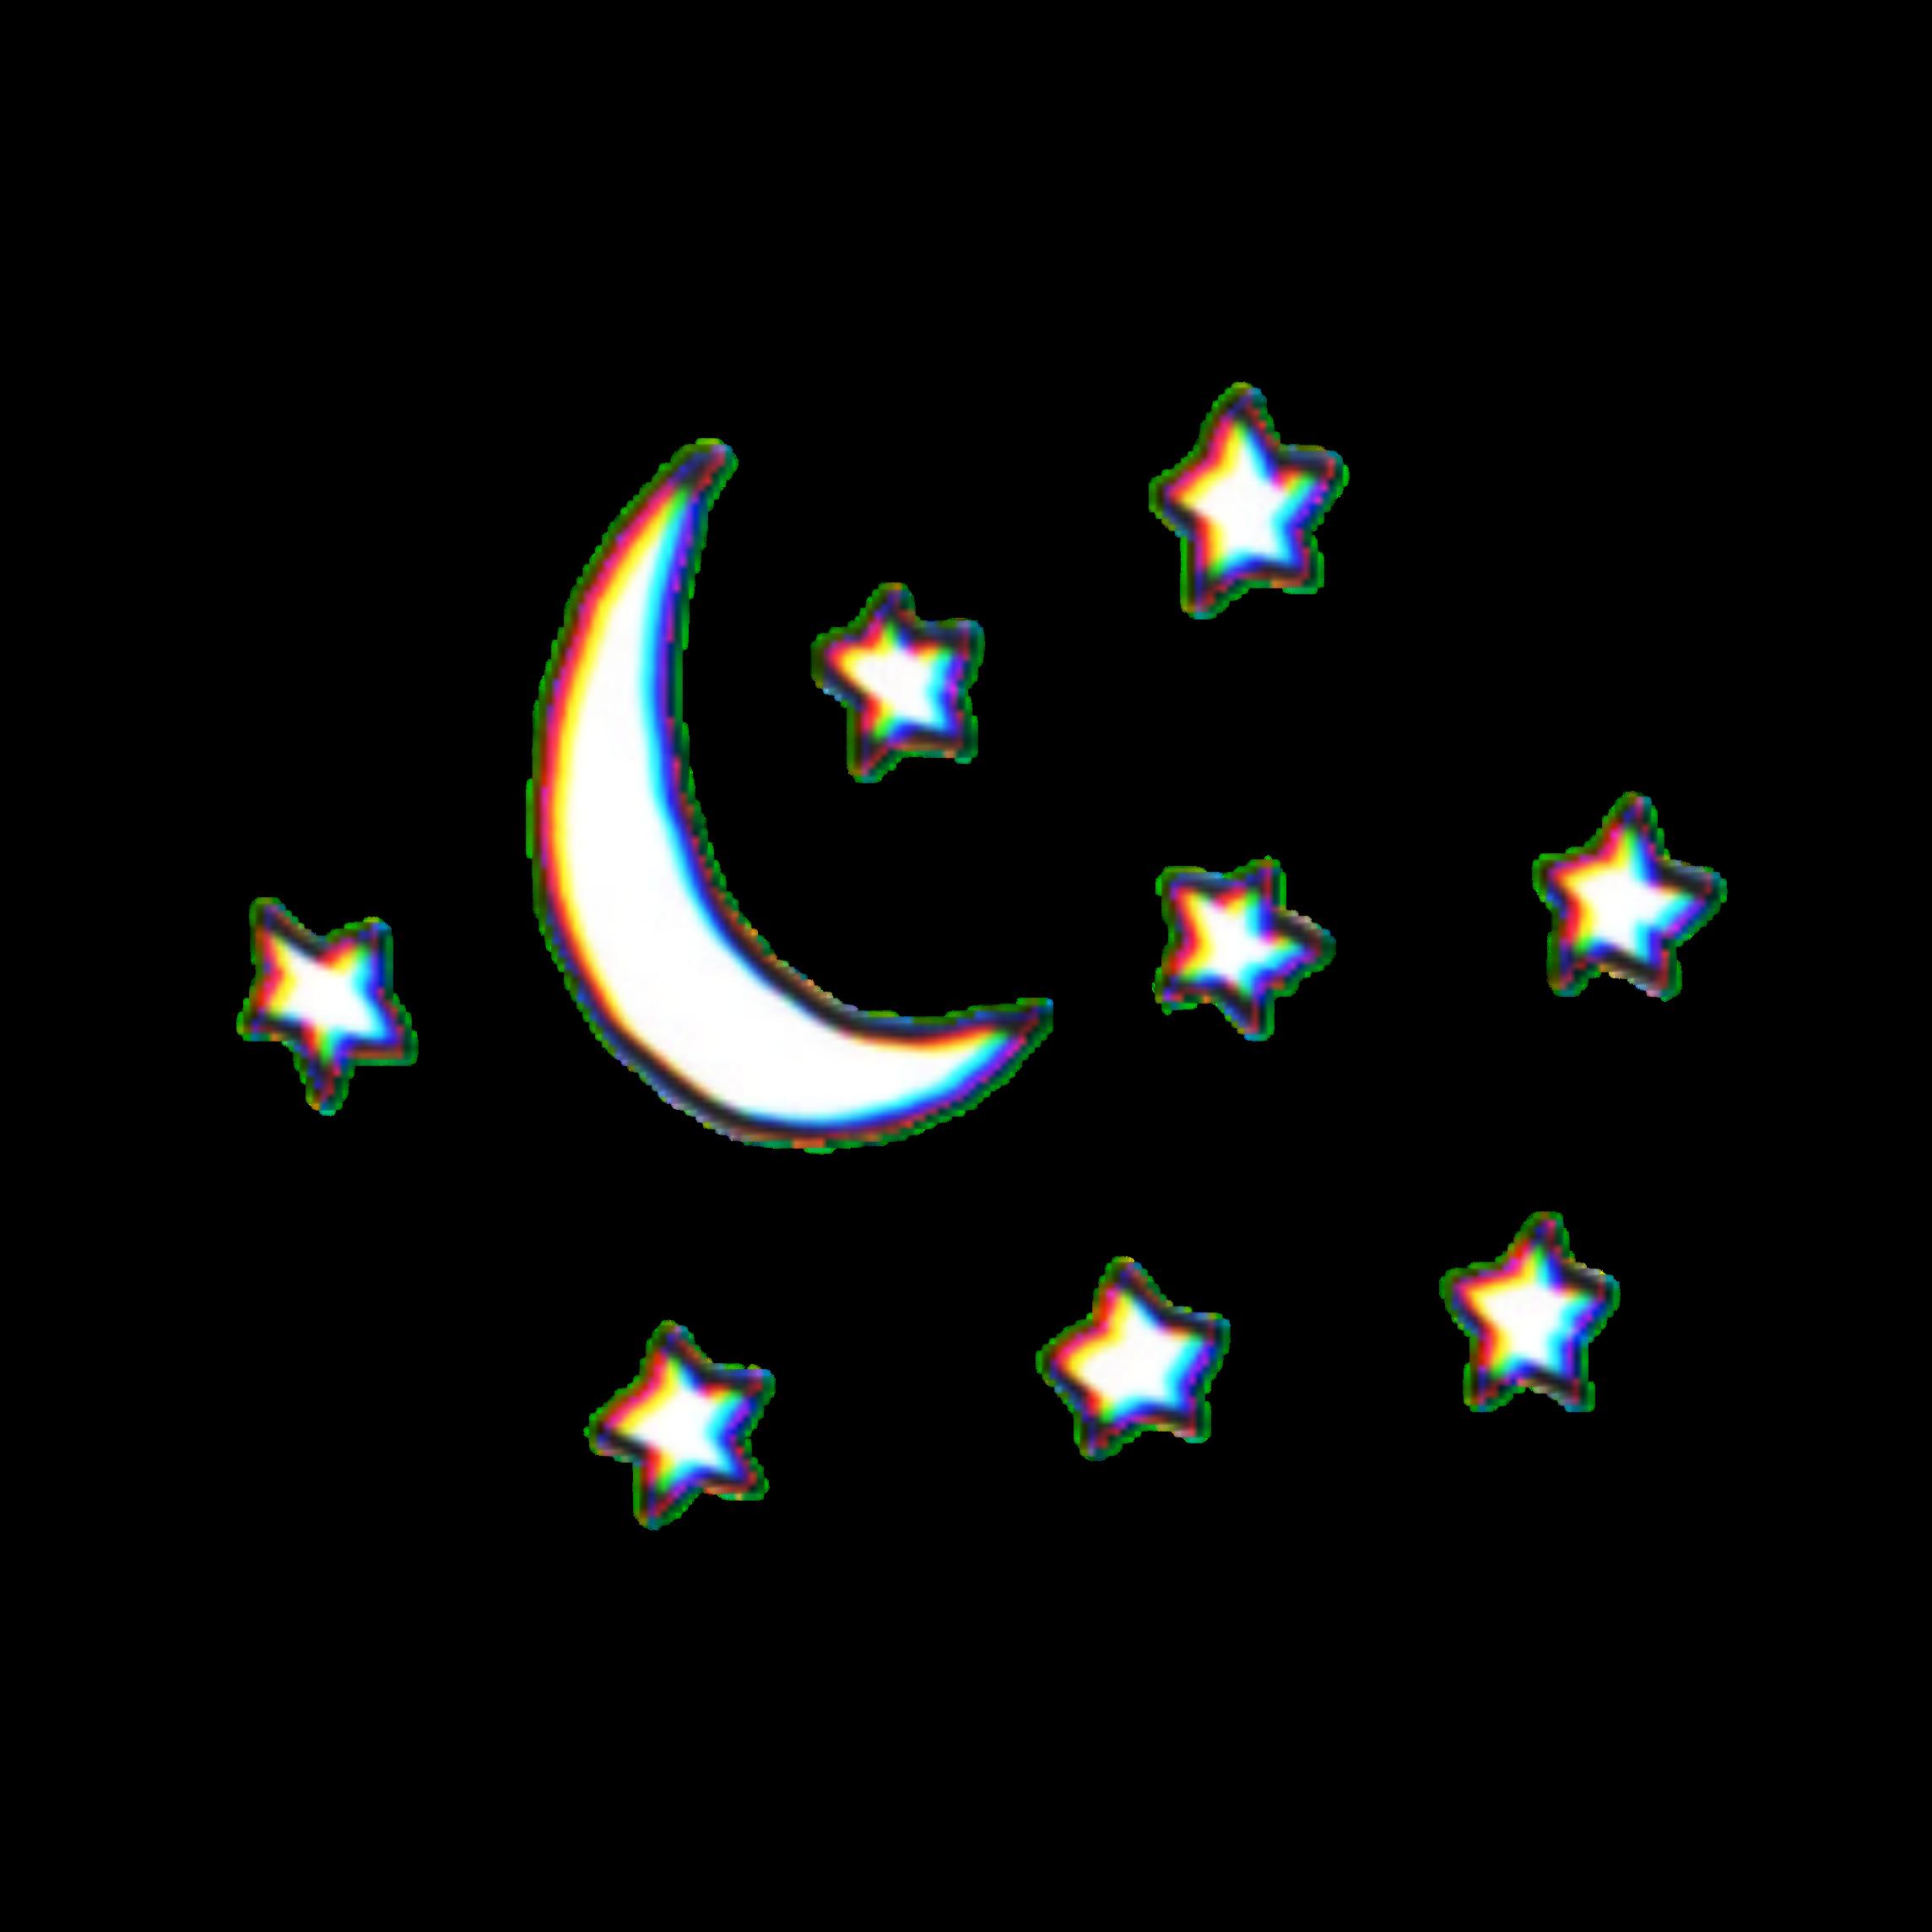 Freetoedit Aesthetic Vaporwave Glitch Retro Doodle Remixit Aesthetic Grunge Computer Sticker Aesthetic Stickers